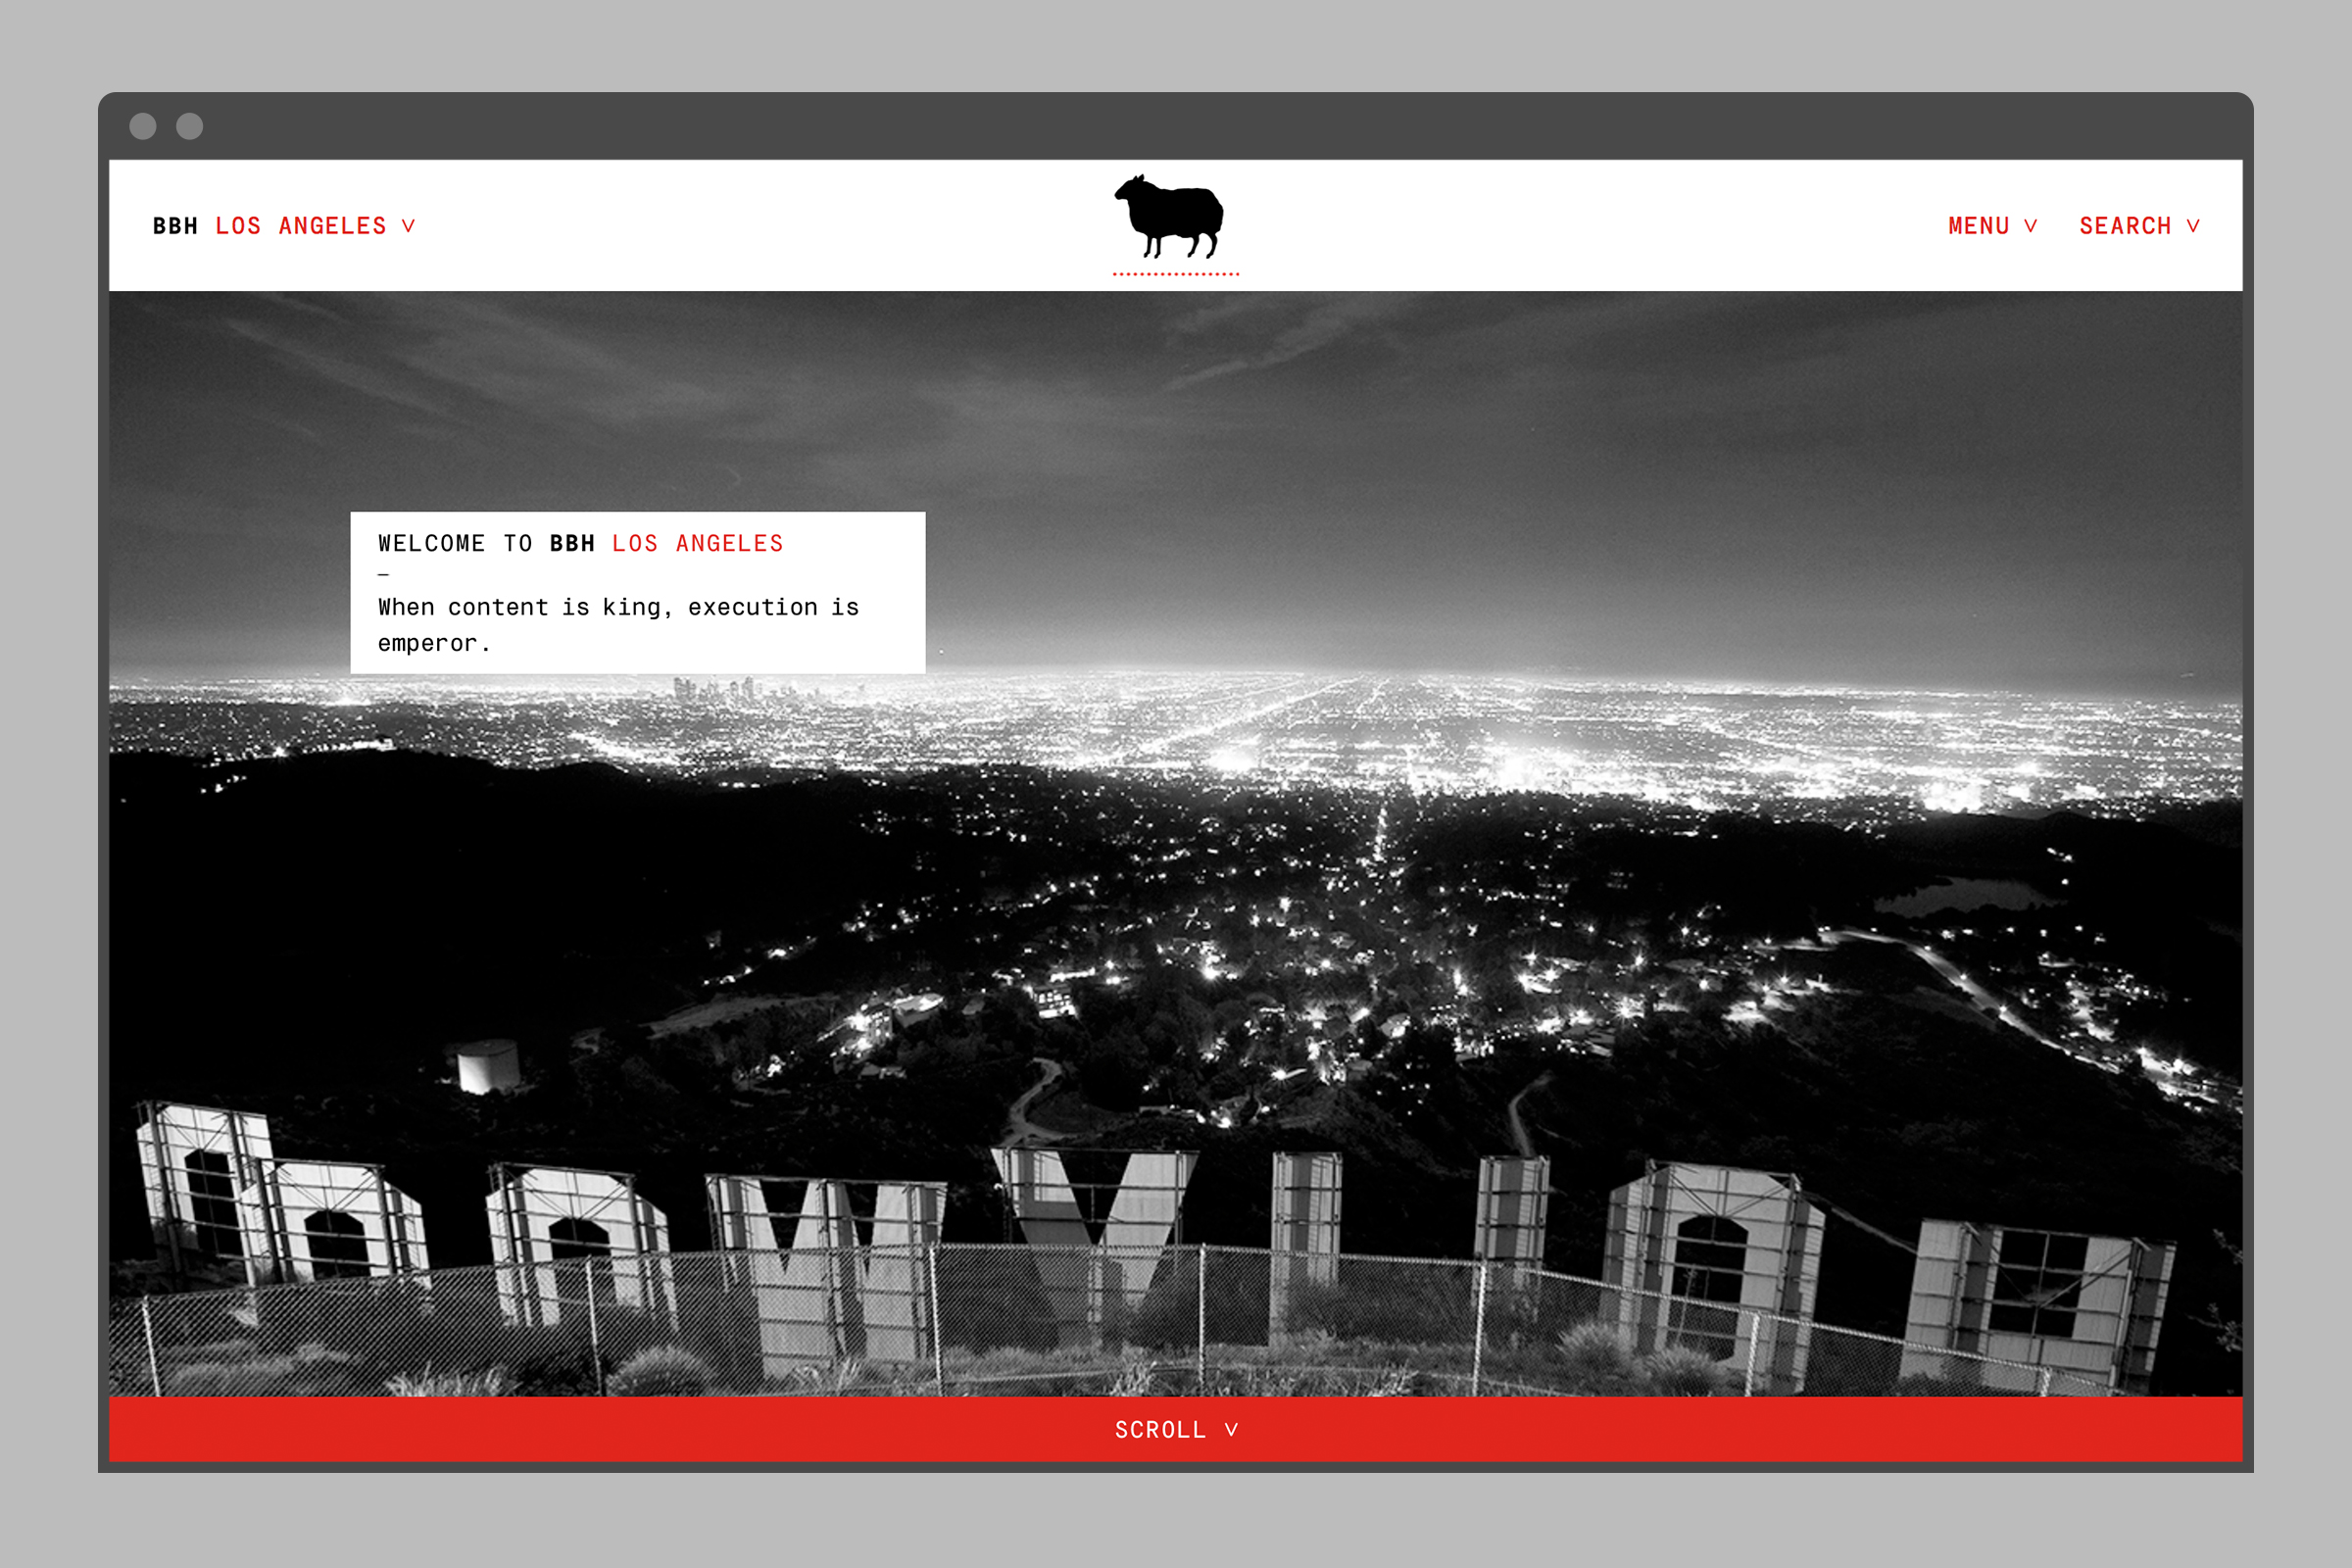 BBH_Web_Browser_Locations-4.jpg